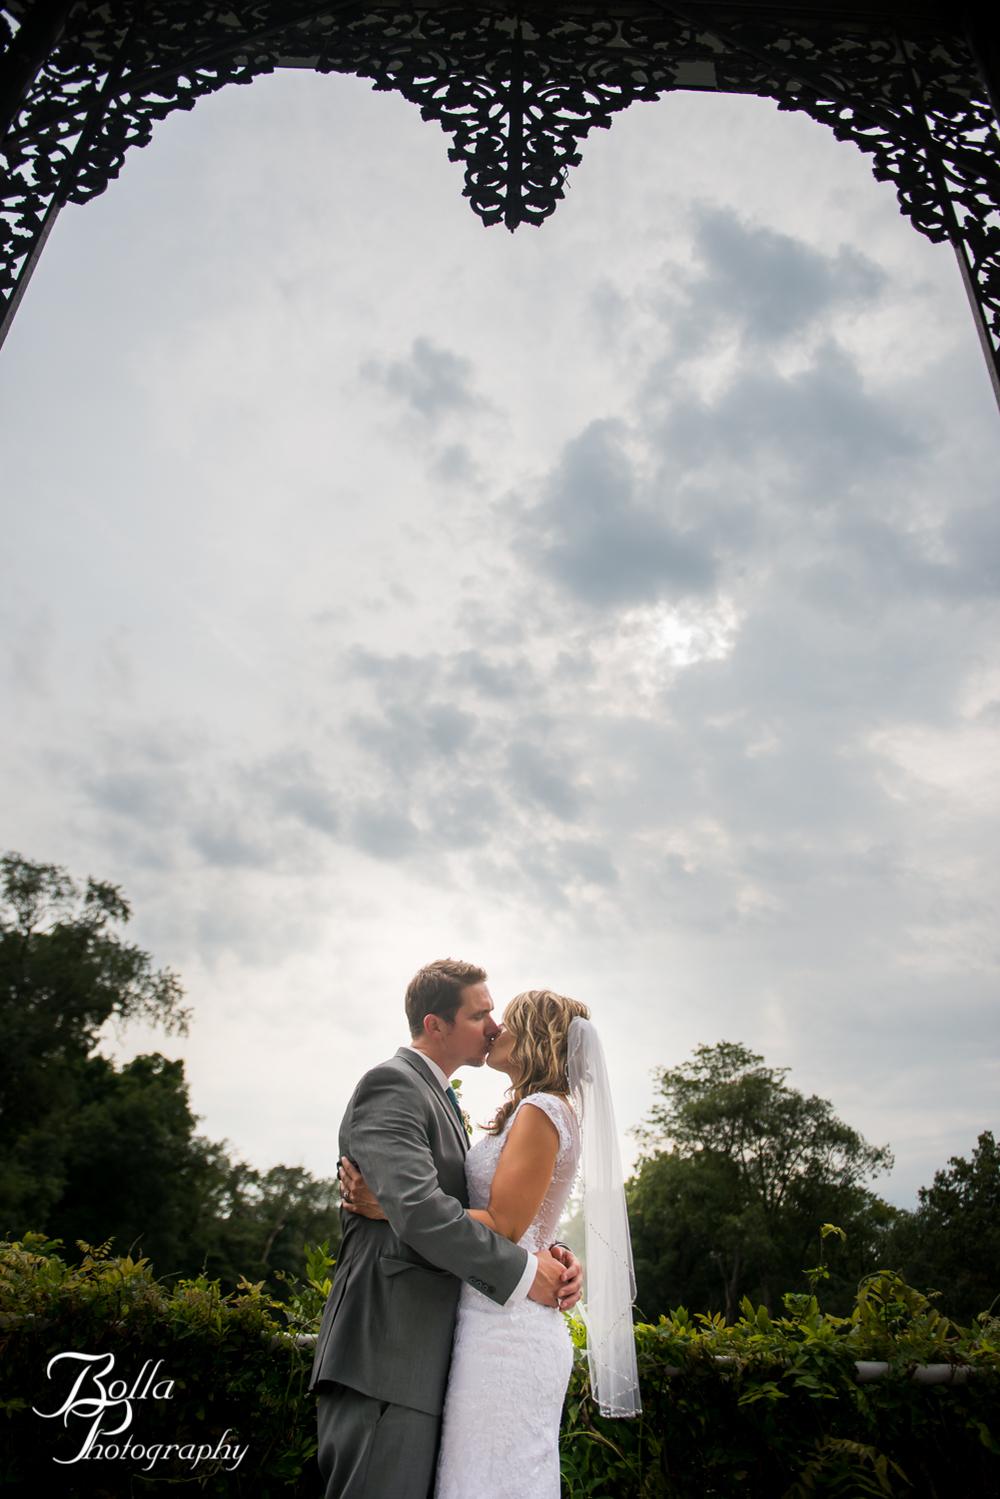 Bolla_Photography_St_Louis_wedding_photographer-0364.jpg